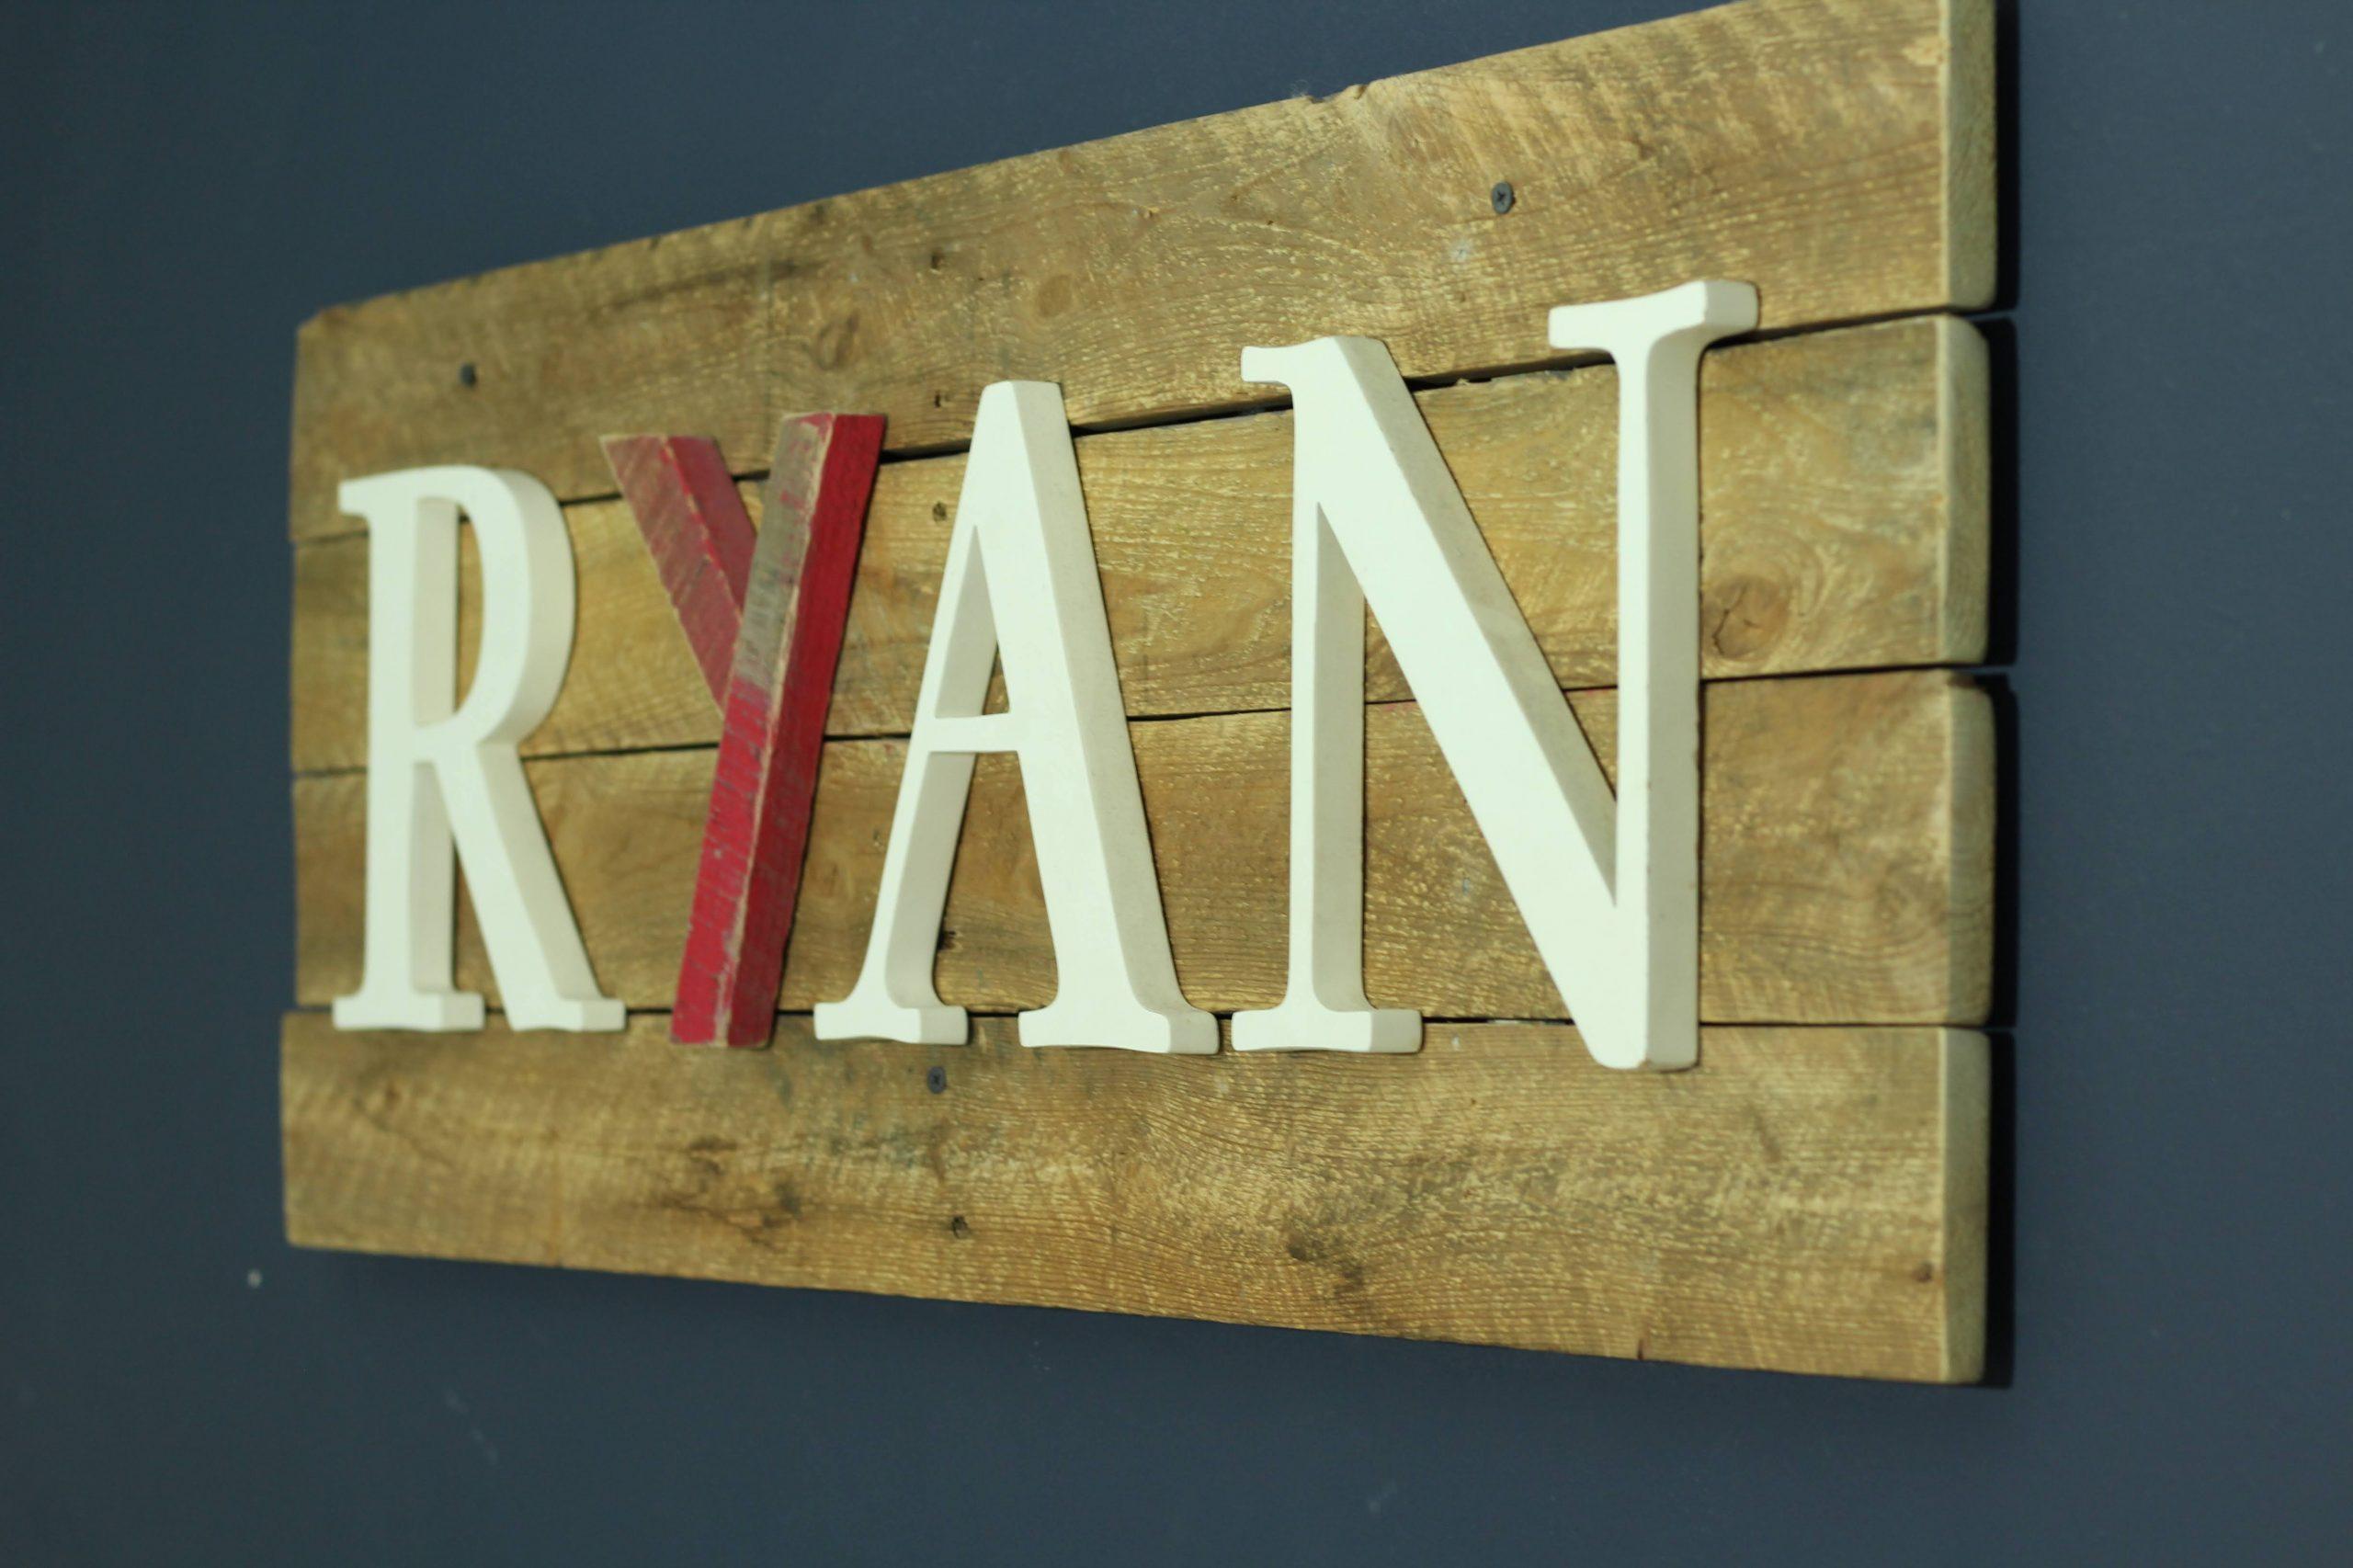 Easy Wooden Pallet Sign Diy In Less Than 1 Hour Lehman Lane